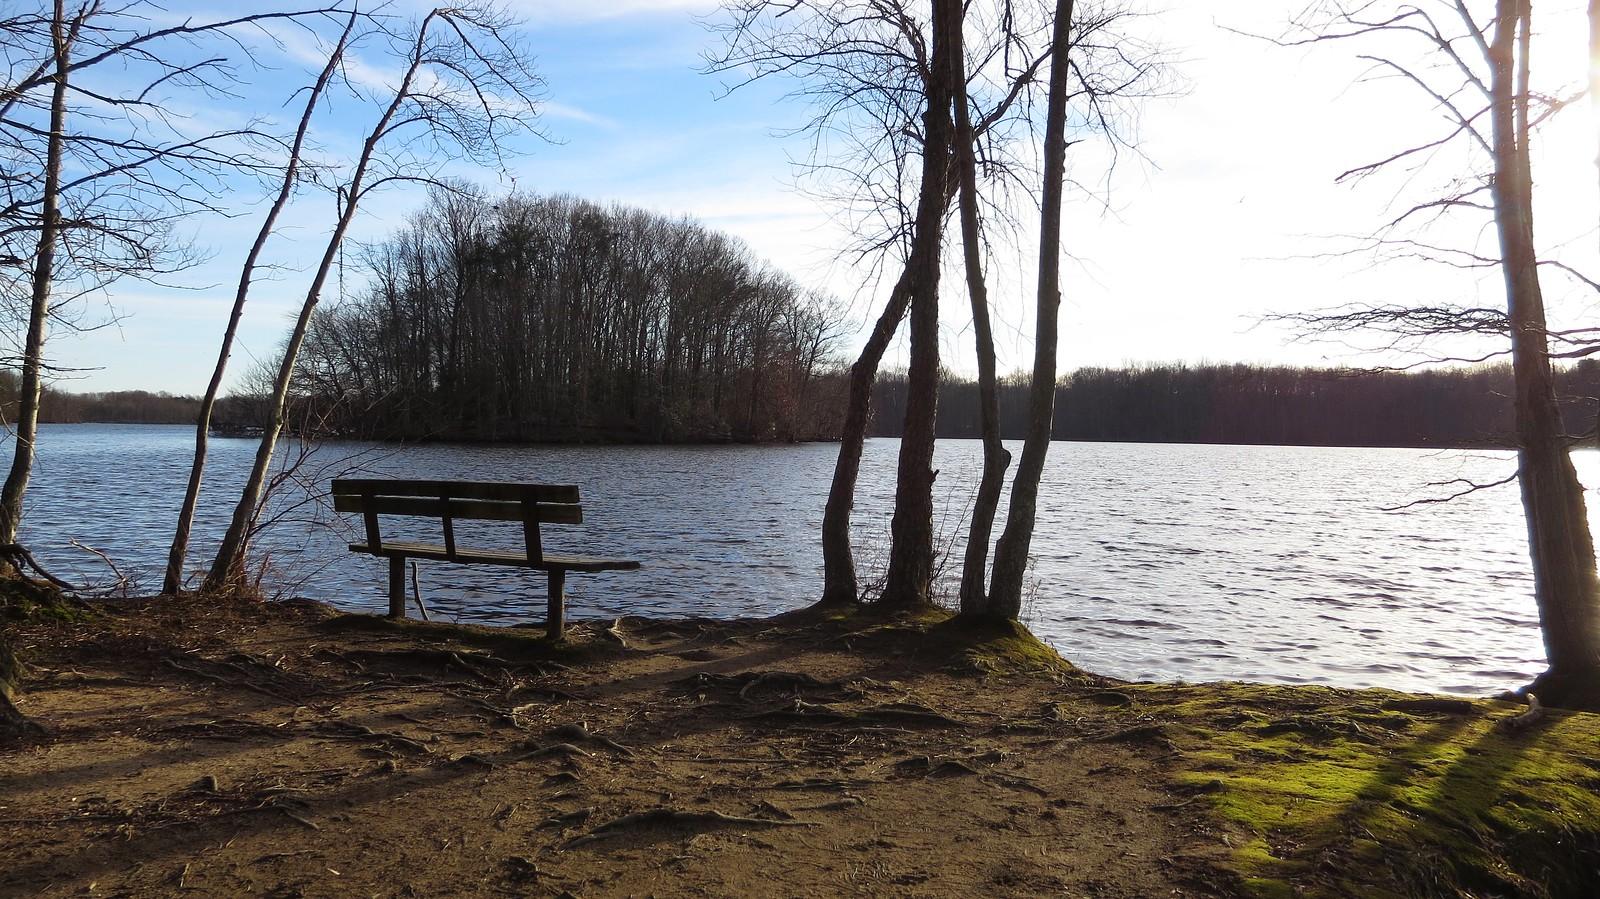 35 Beautiful Photos Of Burke Lake In Fairfax County